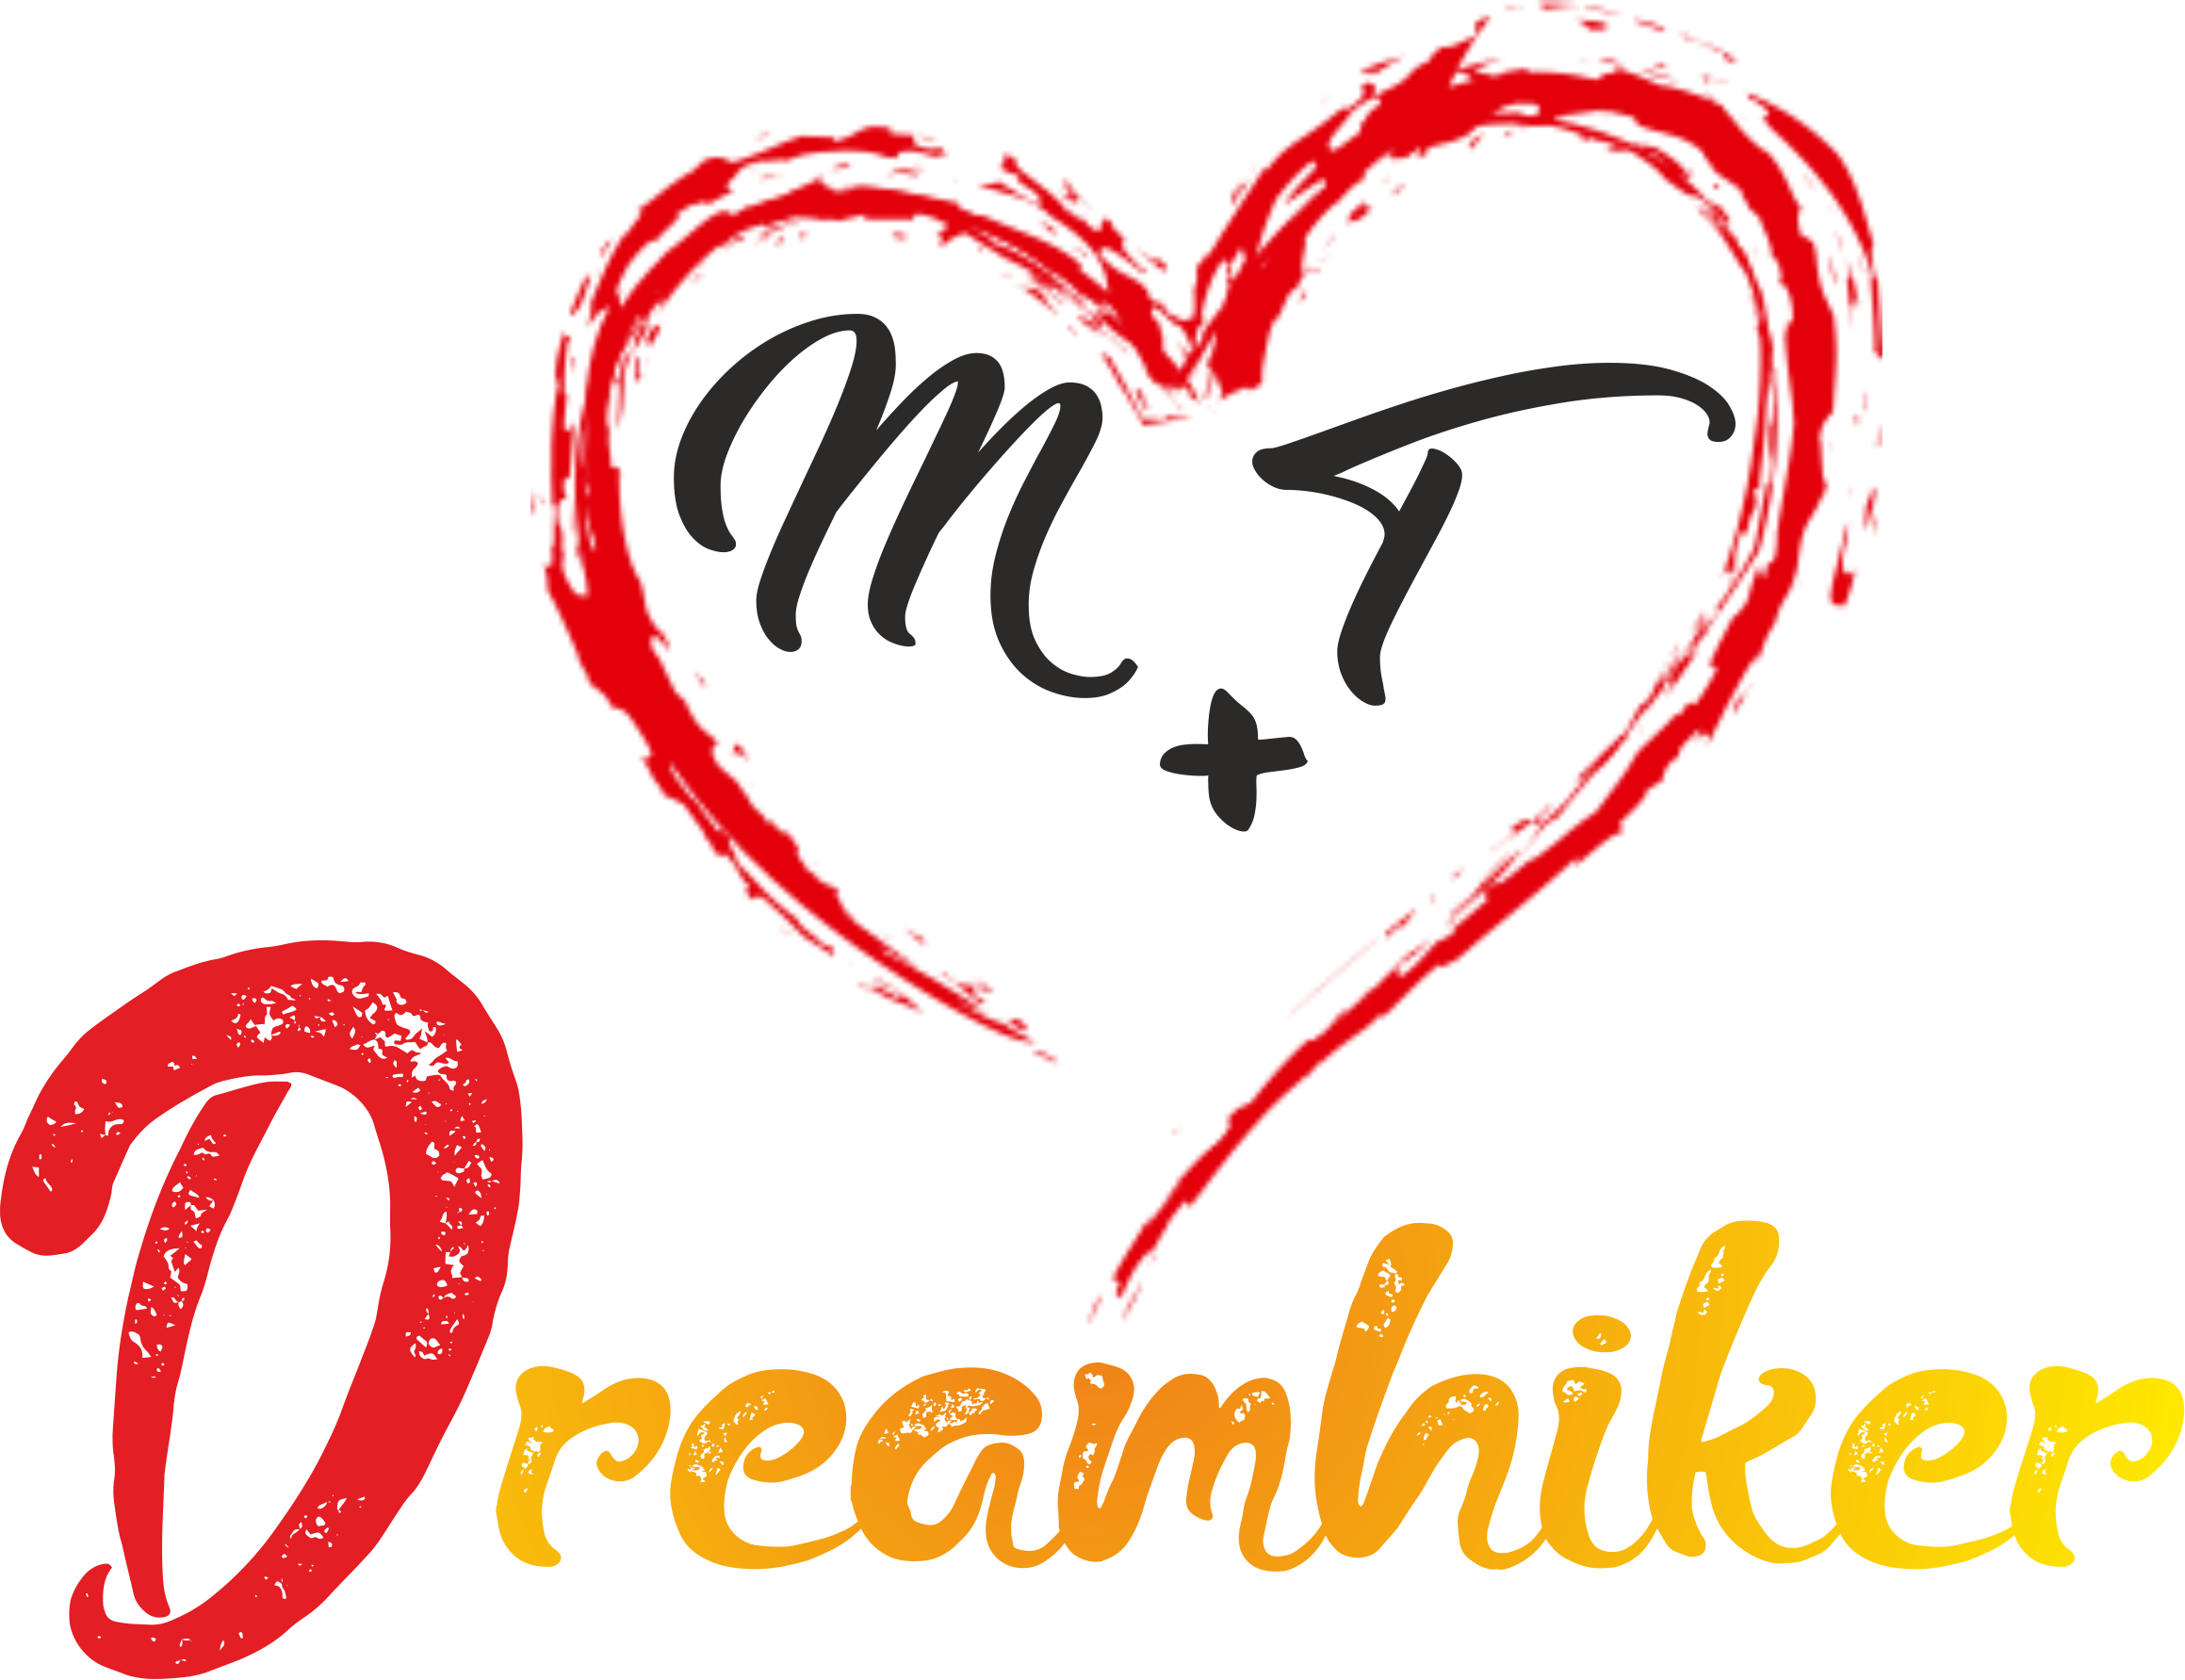 DreamhikerHEART2319×1783